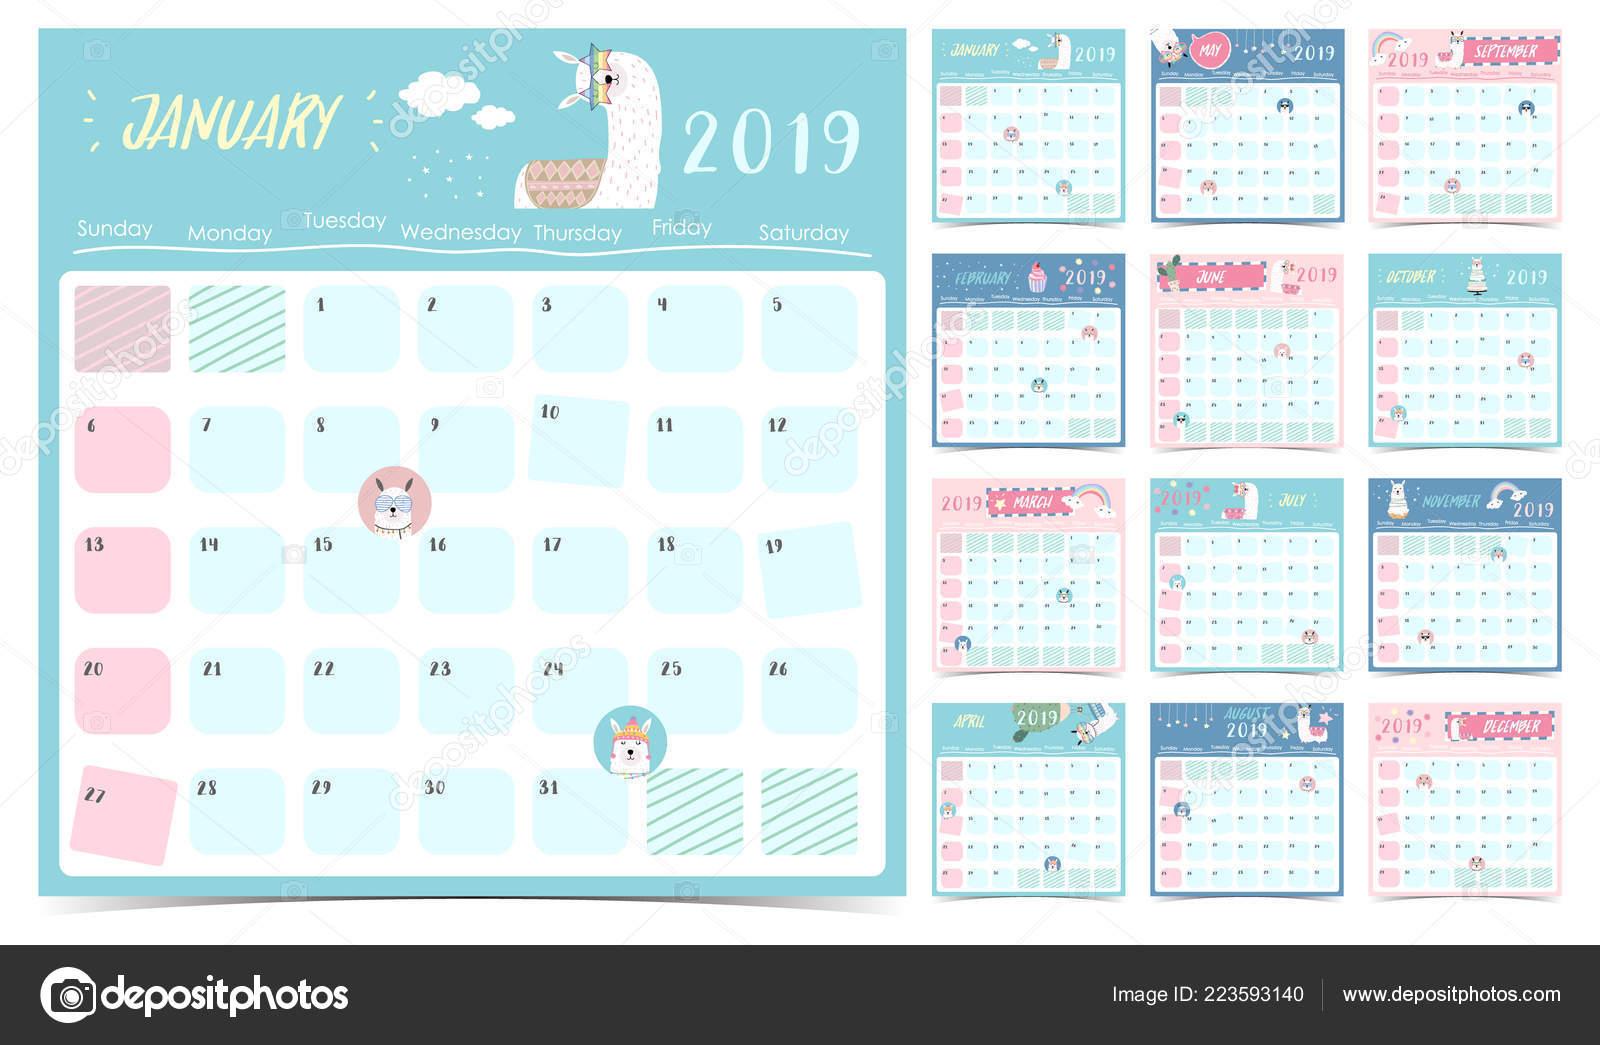 Calendario Mensual 2019 Para Imprimir.Lindo Calendario Mensual 2019 Con Llama Arco Iris Cactus Gafas